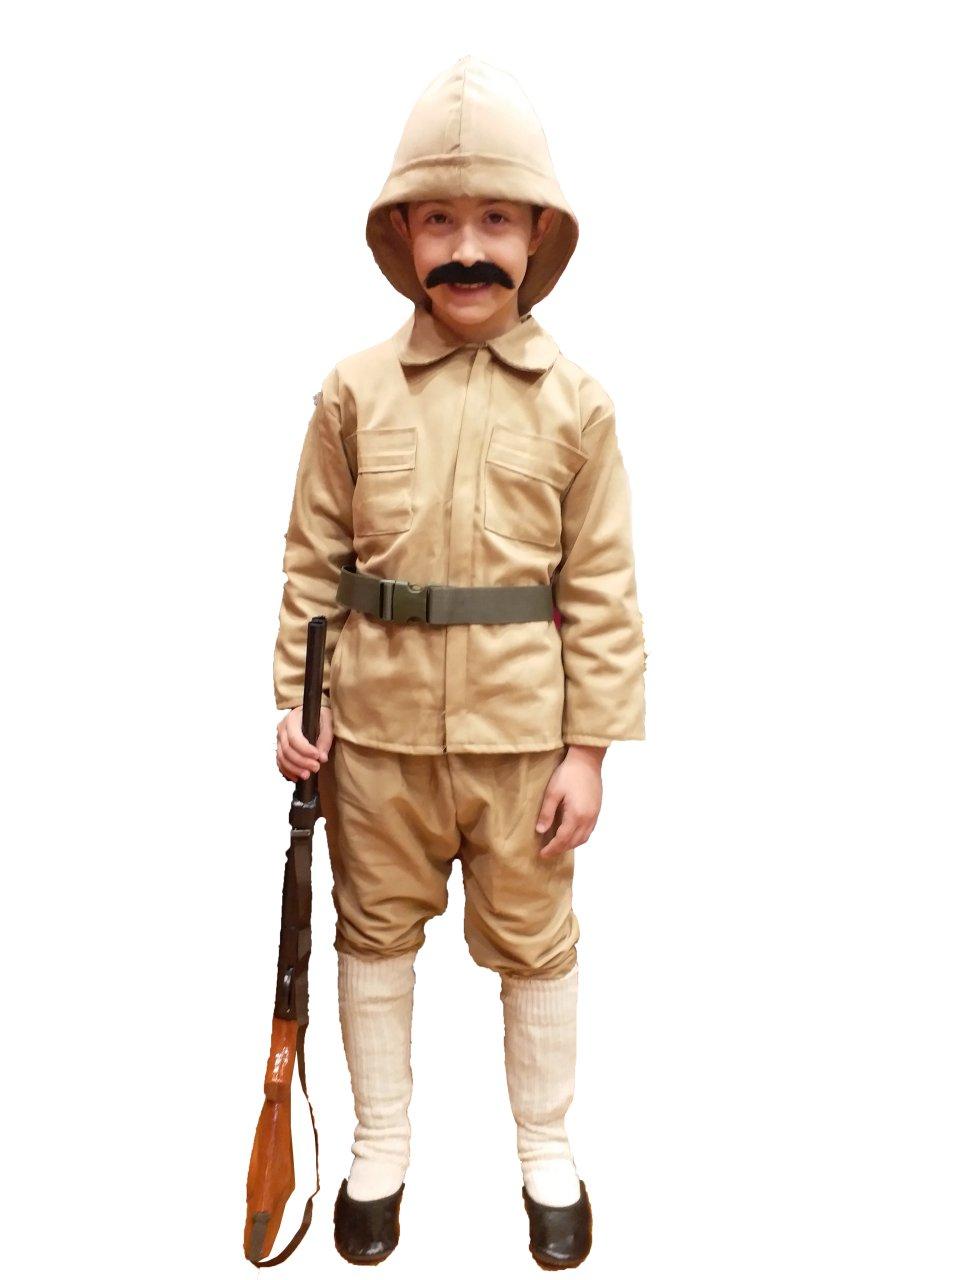 Canakkale Asker Kiyafeti Canakkale Asker Kostumu